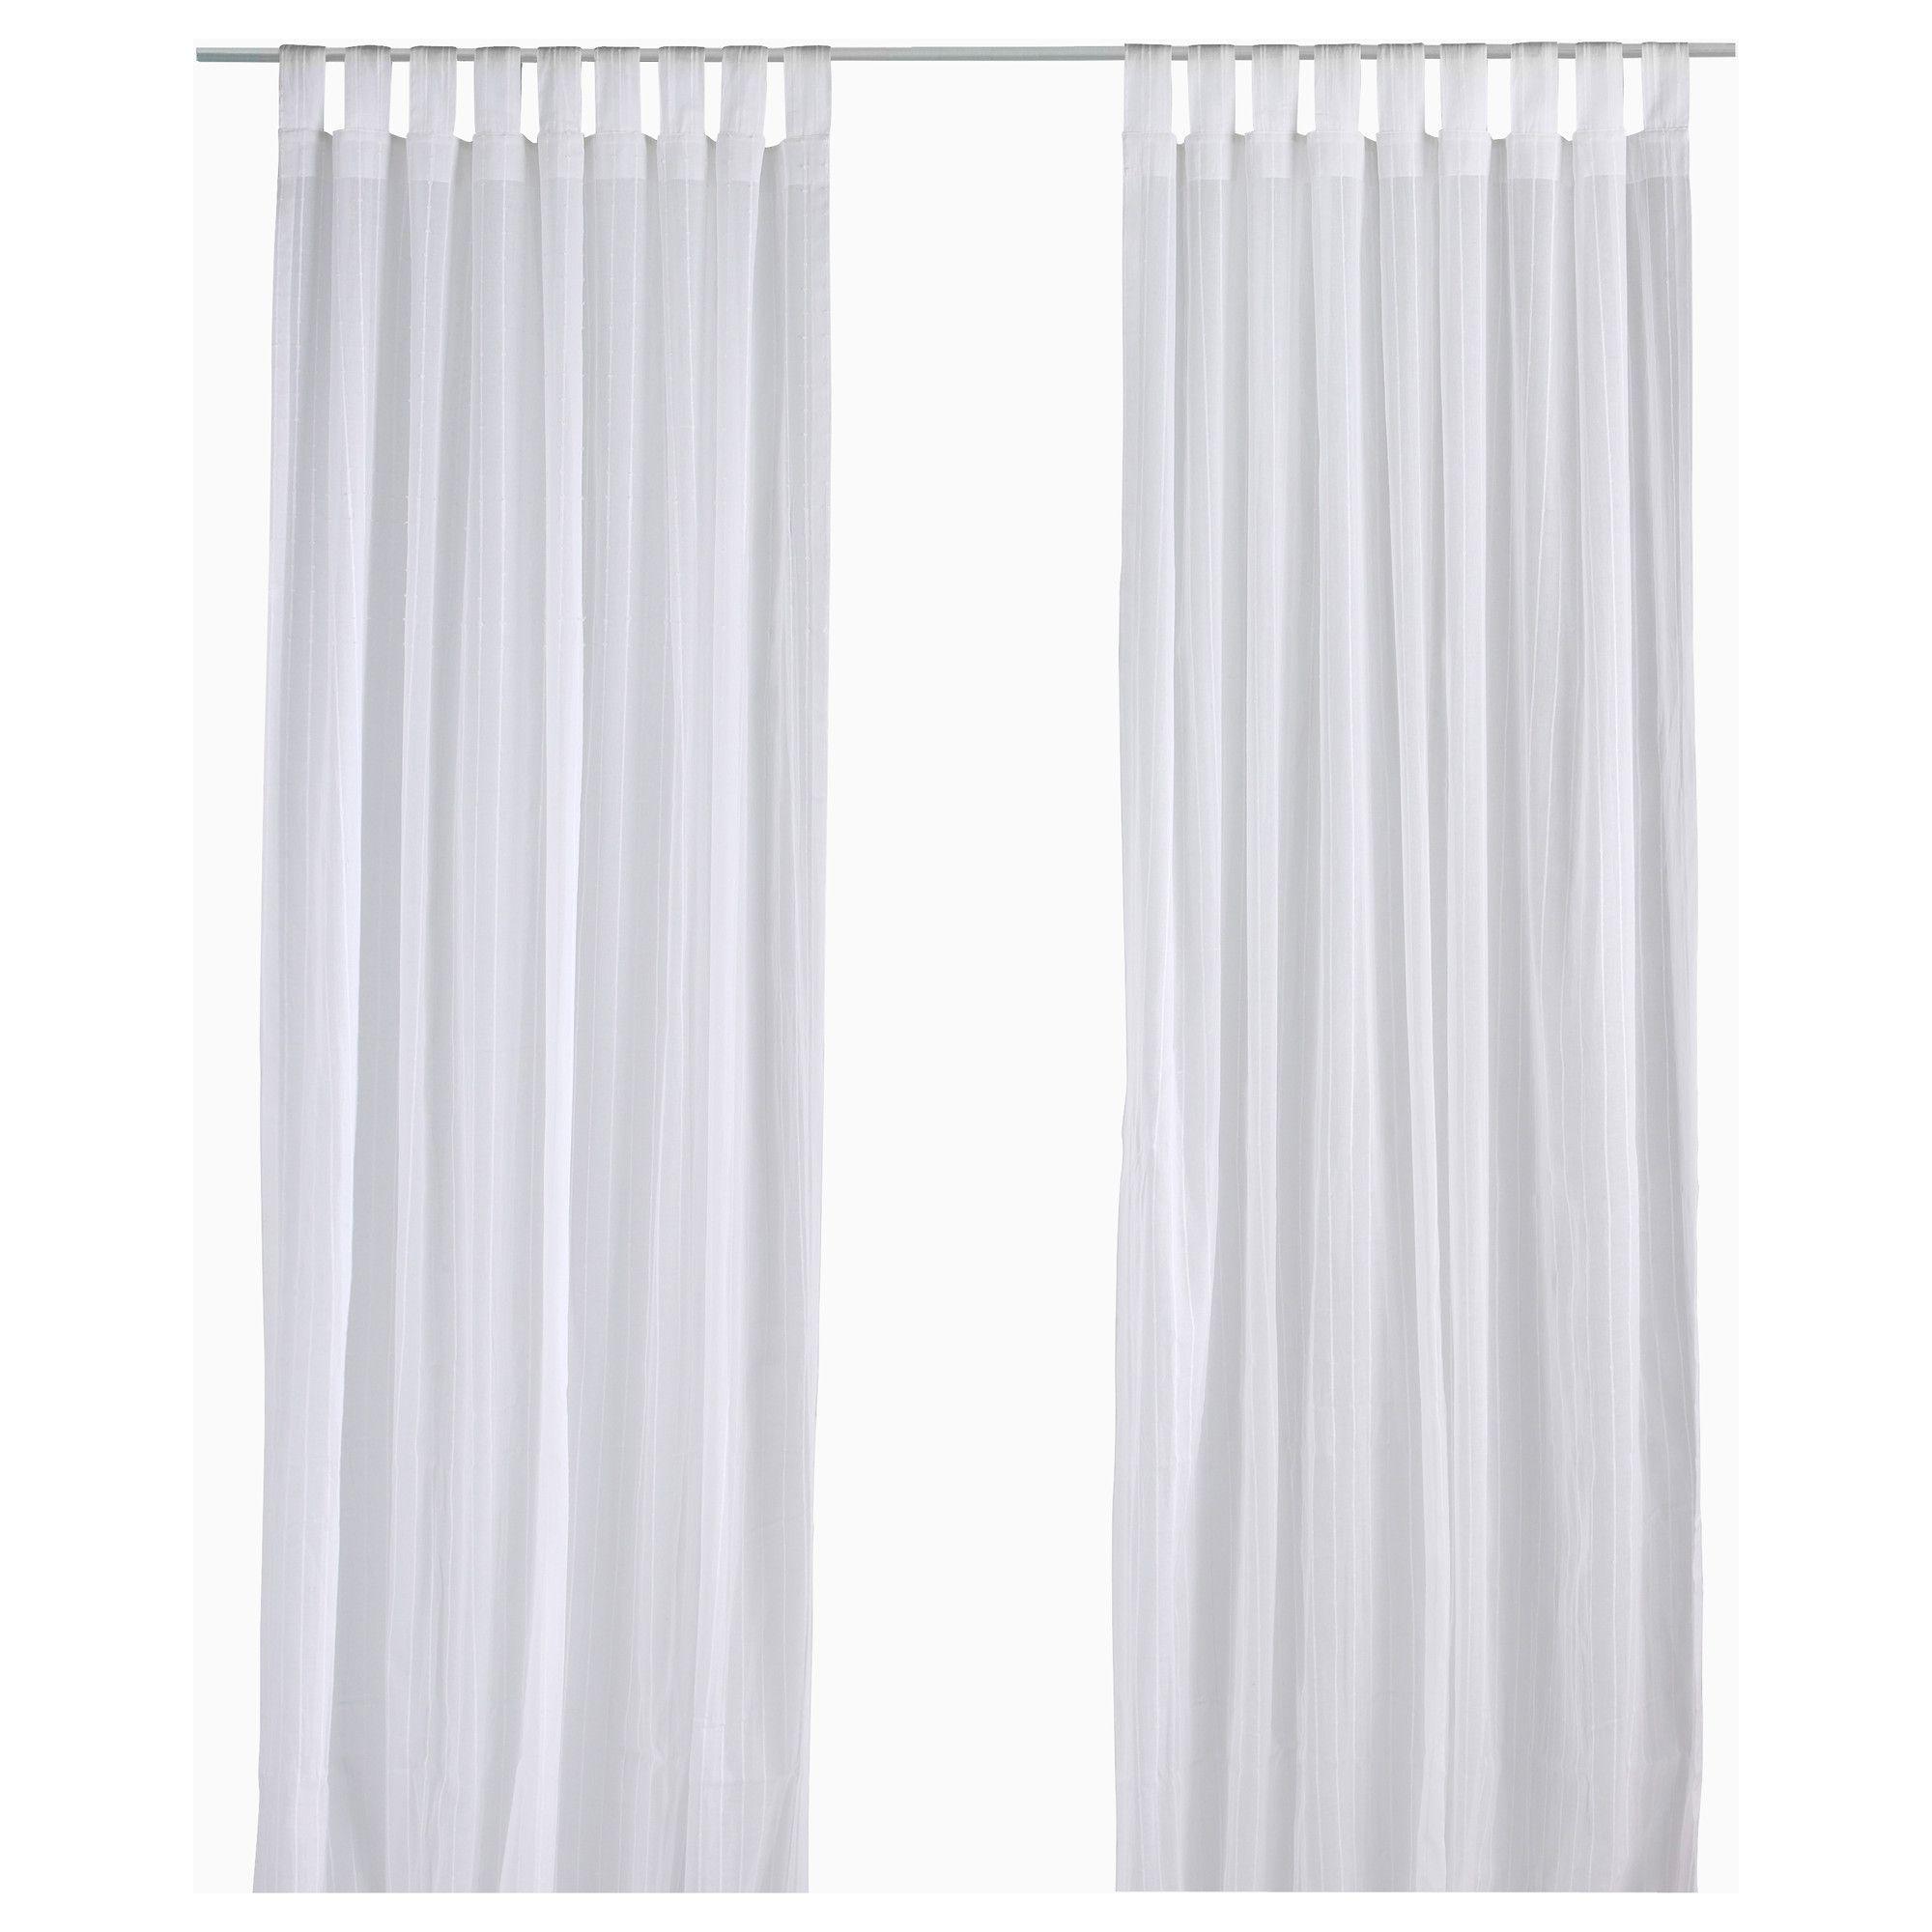 Nautica palmetto bay stripe shower curtain from beddingstyle com - Nautica Palmetto Bay Stripe Shower Curtain From Beddingstyle Com For Family Room Had These At Download